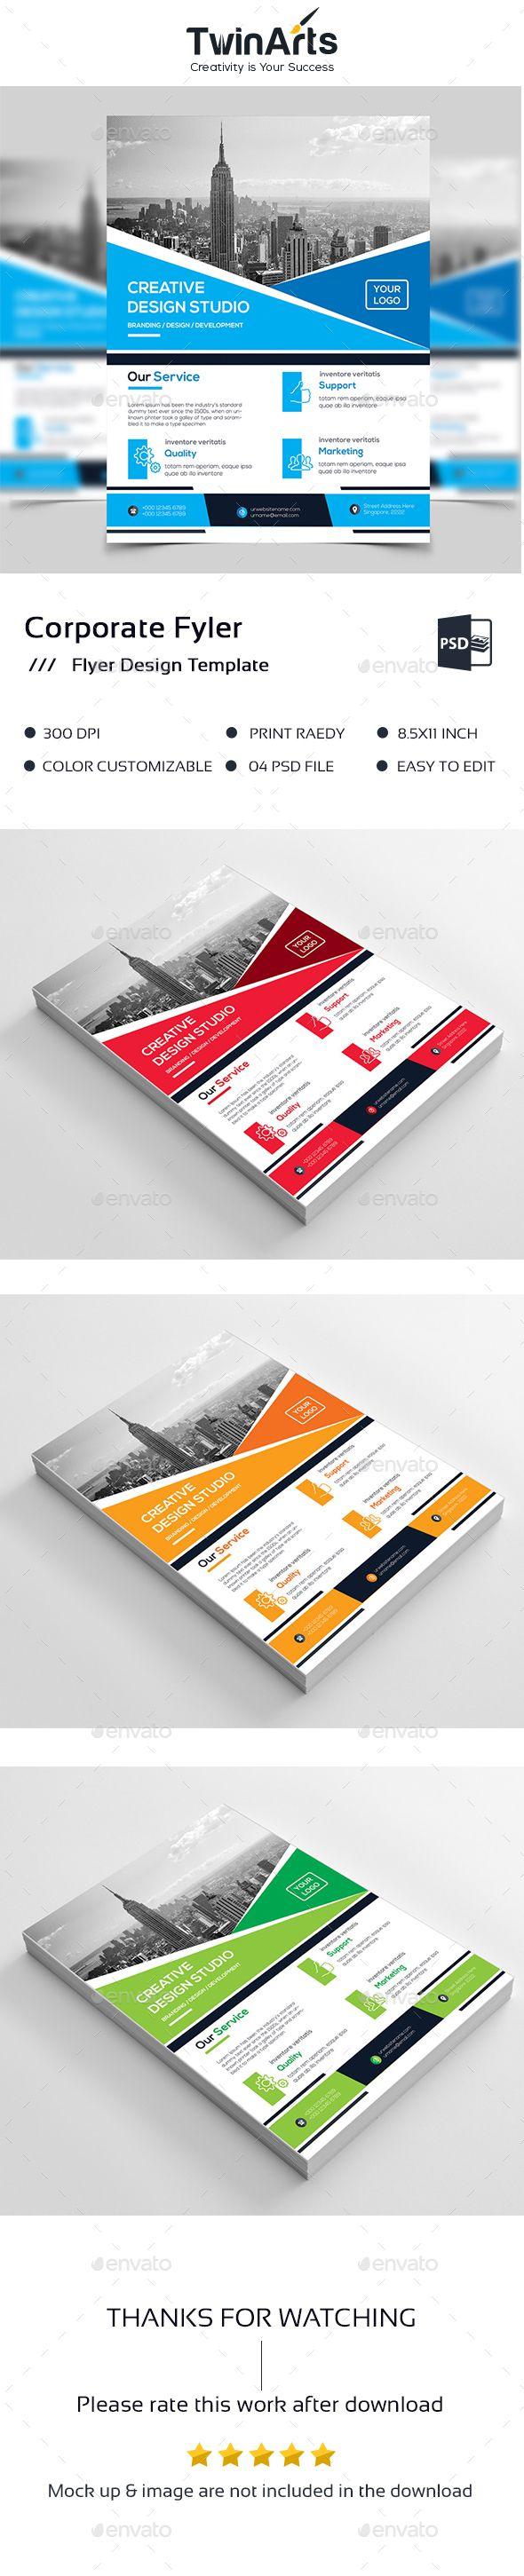 Corporate Flyer Design Template PSD #busness #design